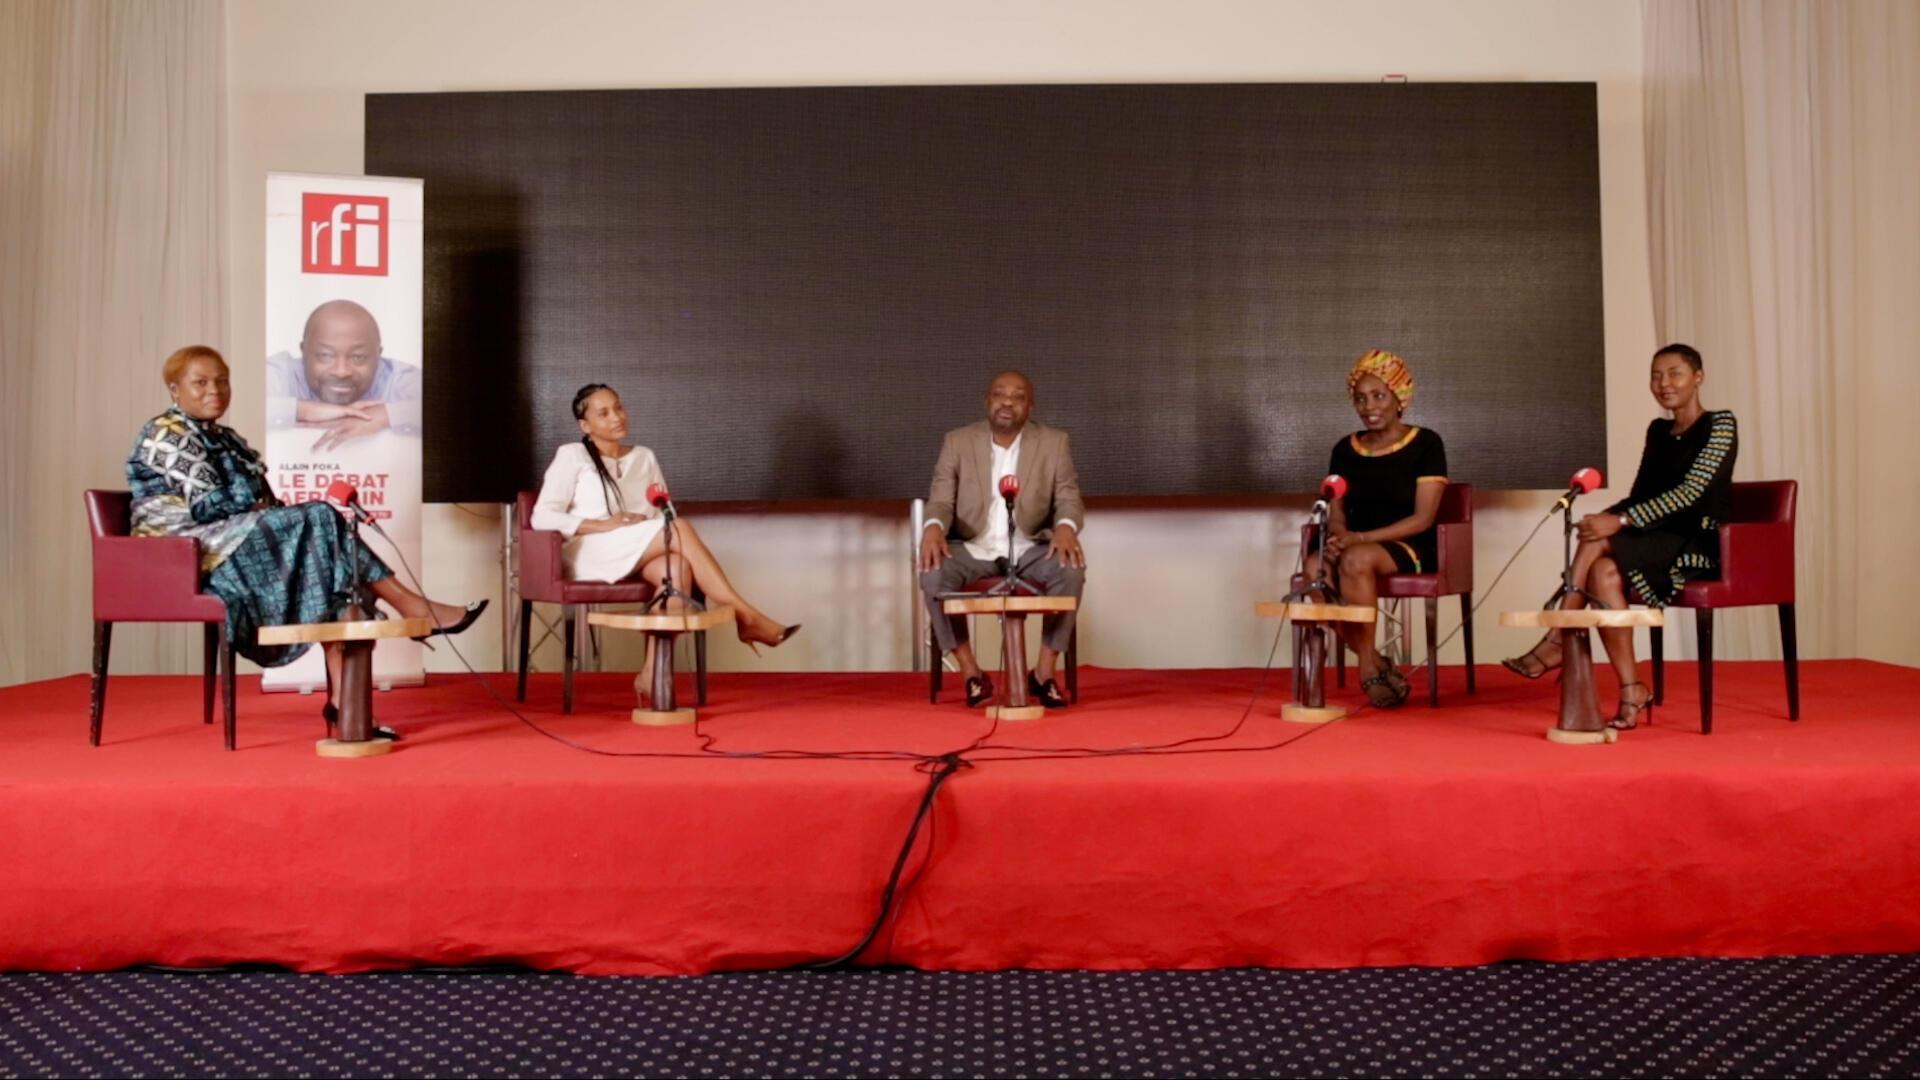 Enregistrement du débat africain à Abidjan, avec Alain Foka (2 juin 2021)